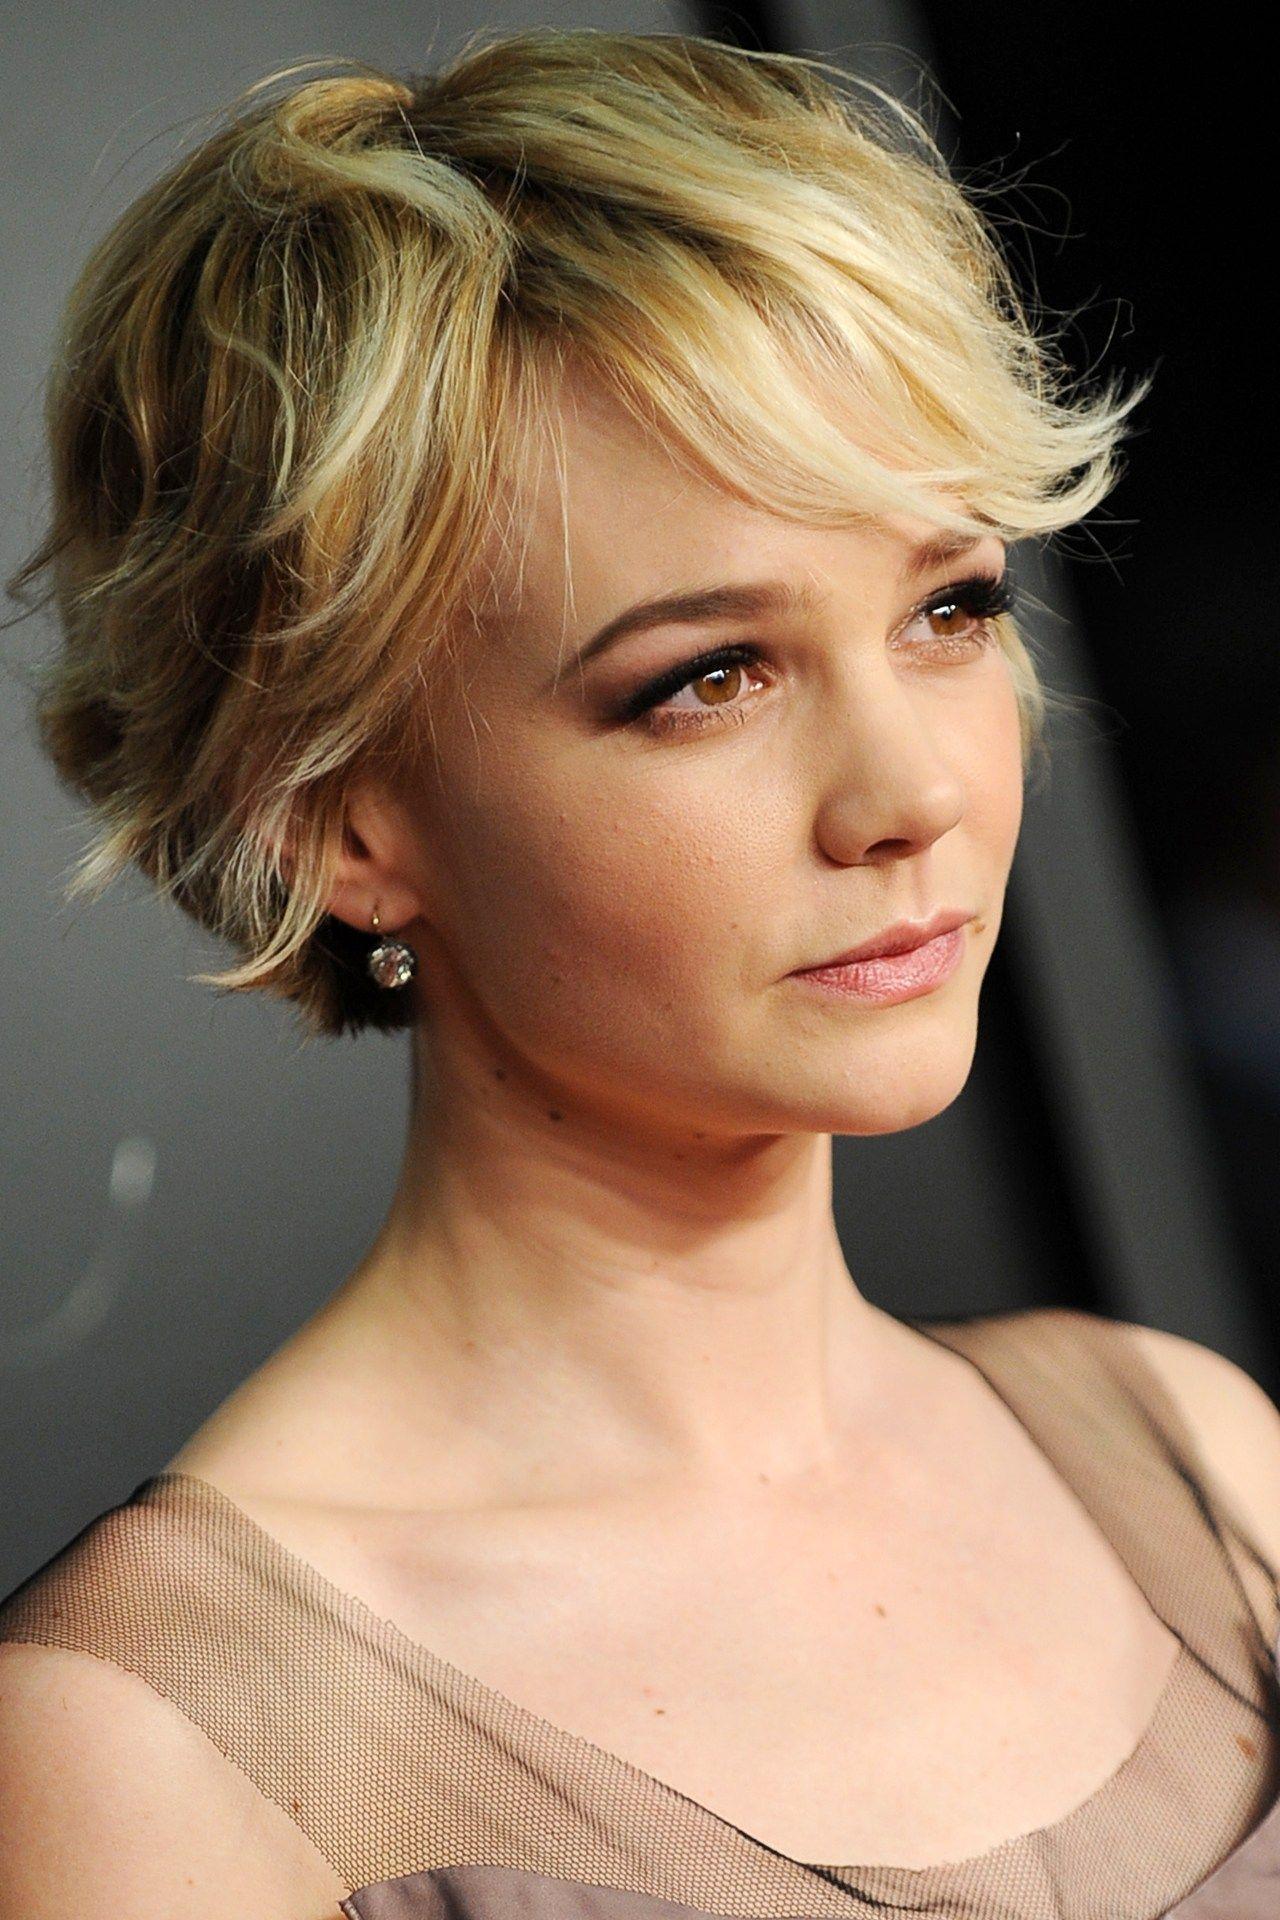 Heroine haircut images carey mulligan hair style file  heroine inspiration  pinterest